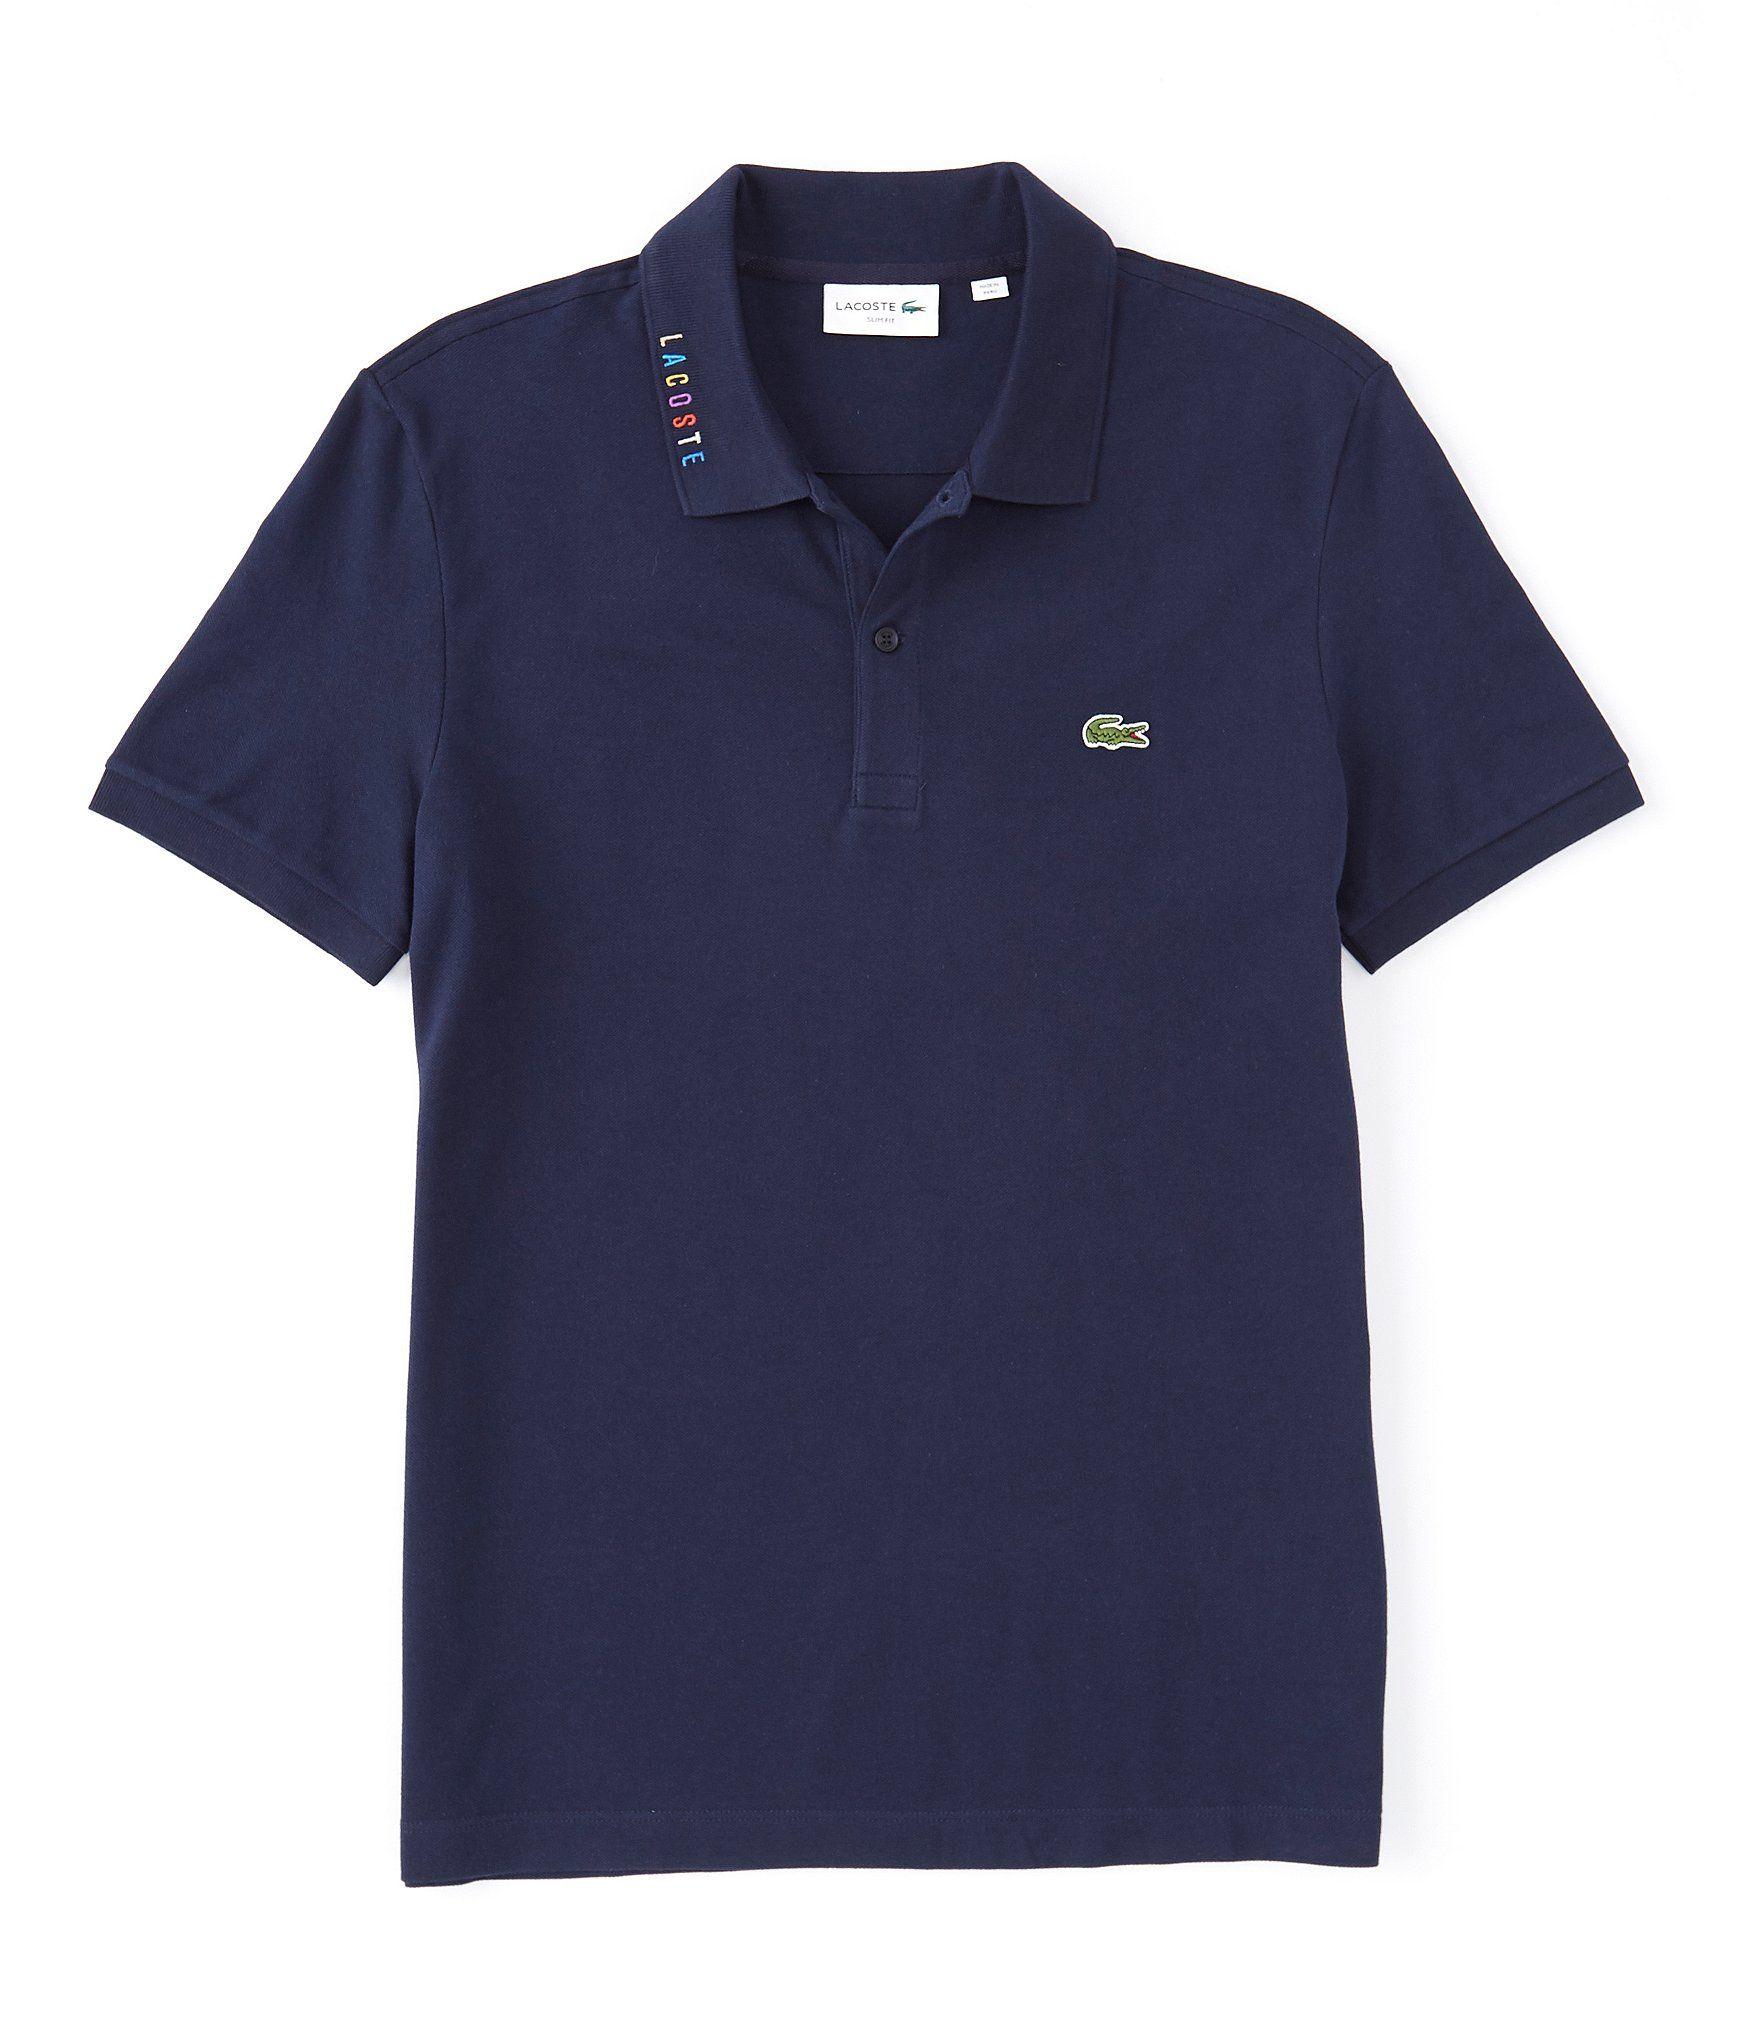 Slim Fit Stretch Pique Short Sleeve Polo Shirt Lacoste Shirts Pique